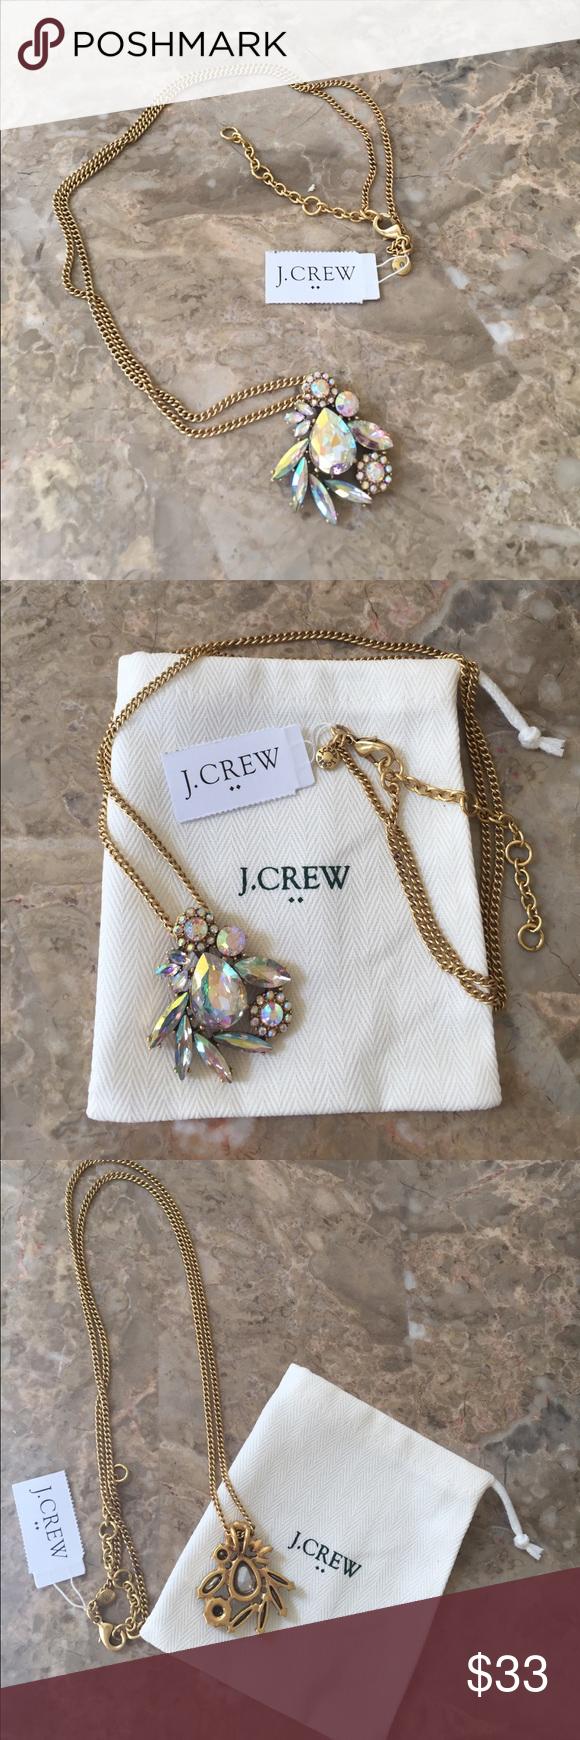 Bnwt jcrew rhinestone long gold chain necklace chains